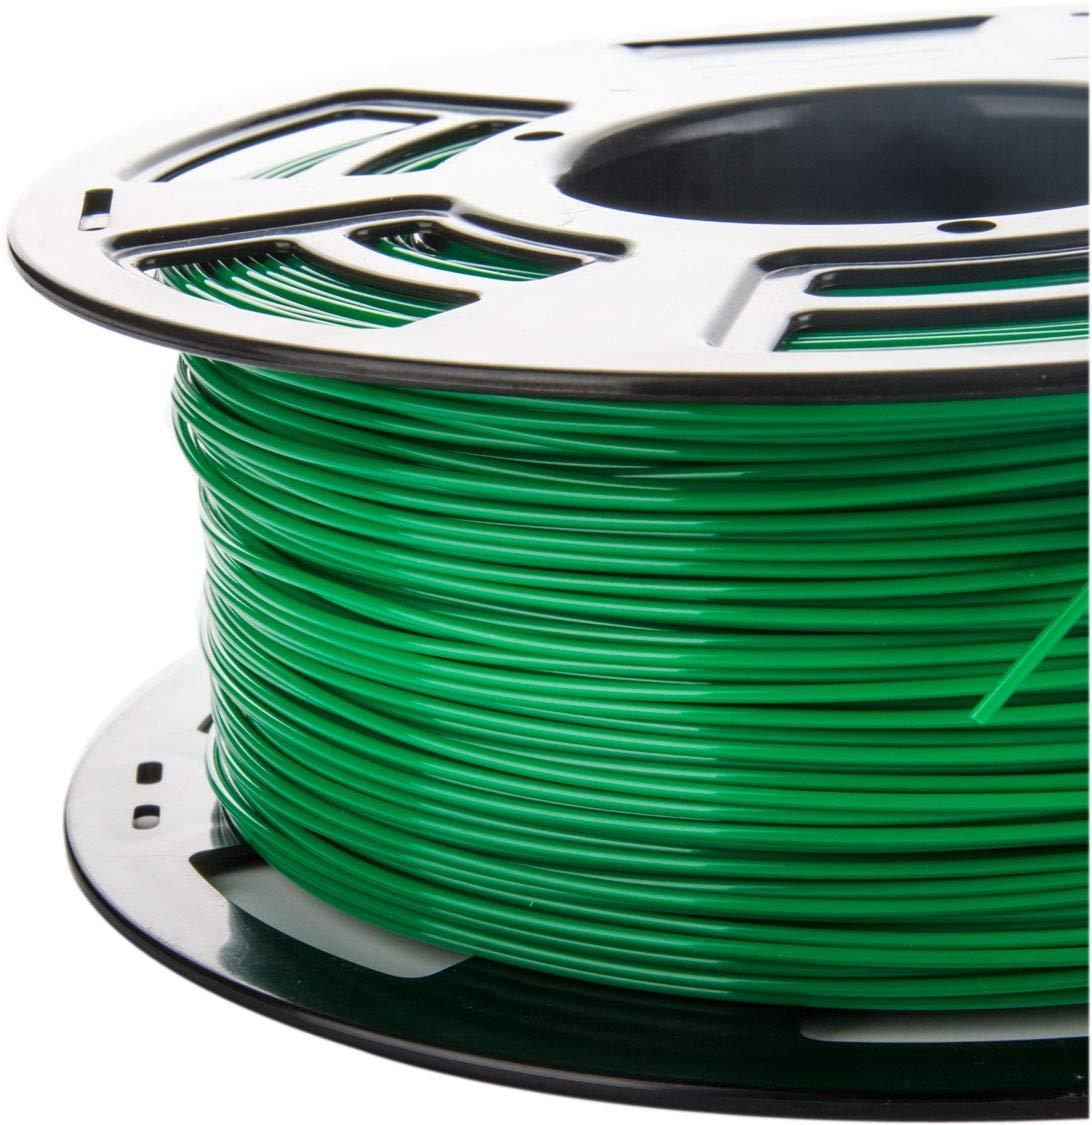 Stronghero3D Desktop FDM 3D printer 1.75mm PLA filament Green 1kg(2.2 lbs) Dimension Accuracy +/-0.05mm